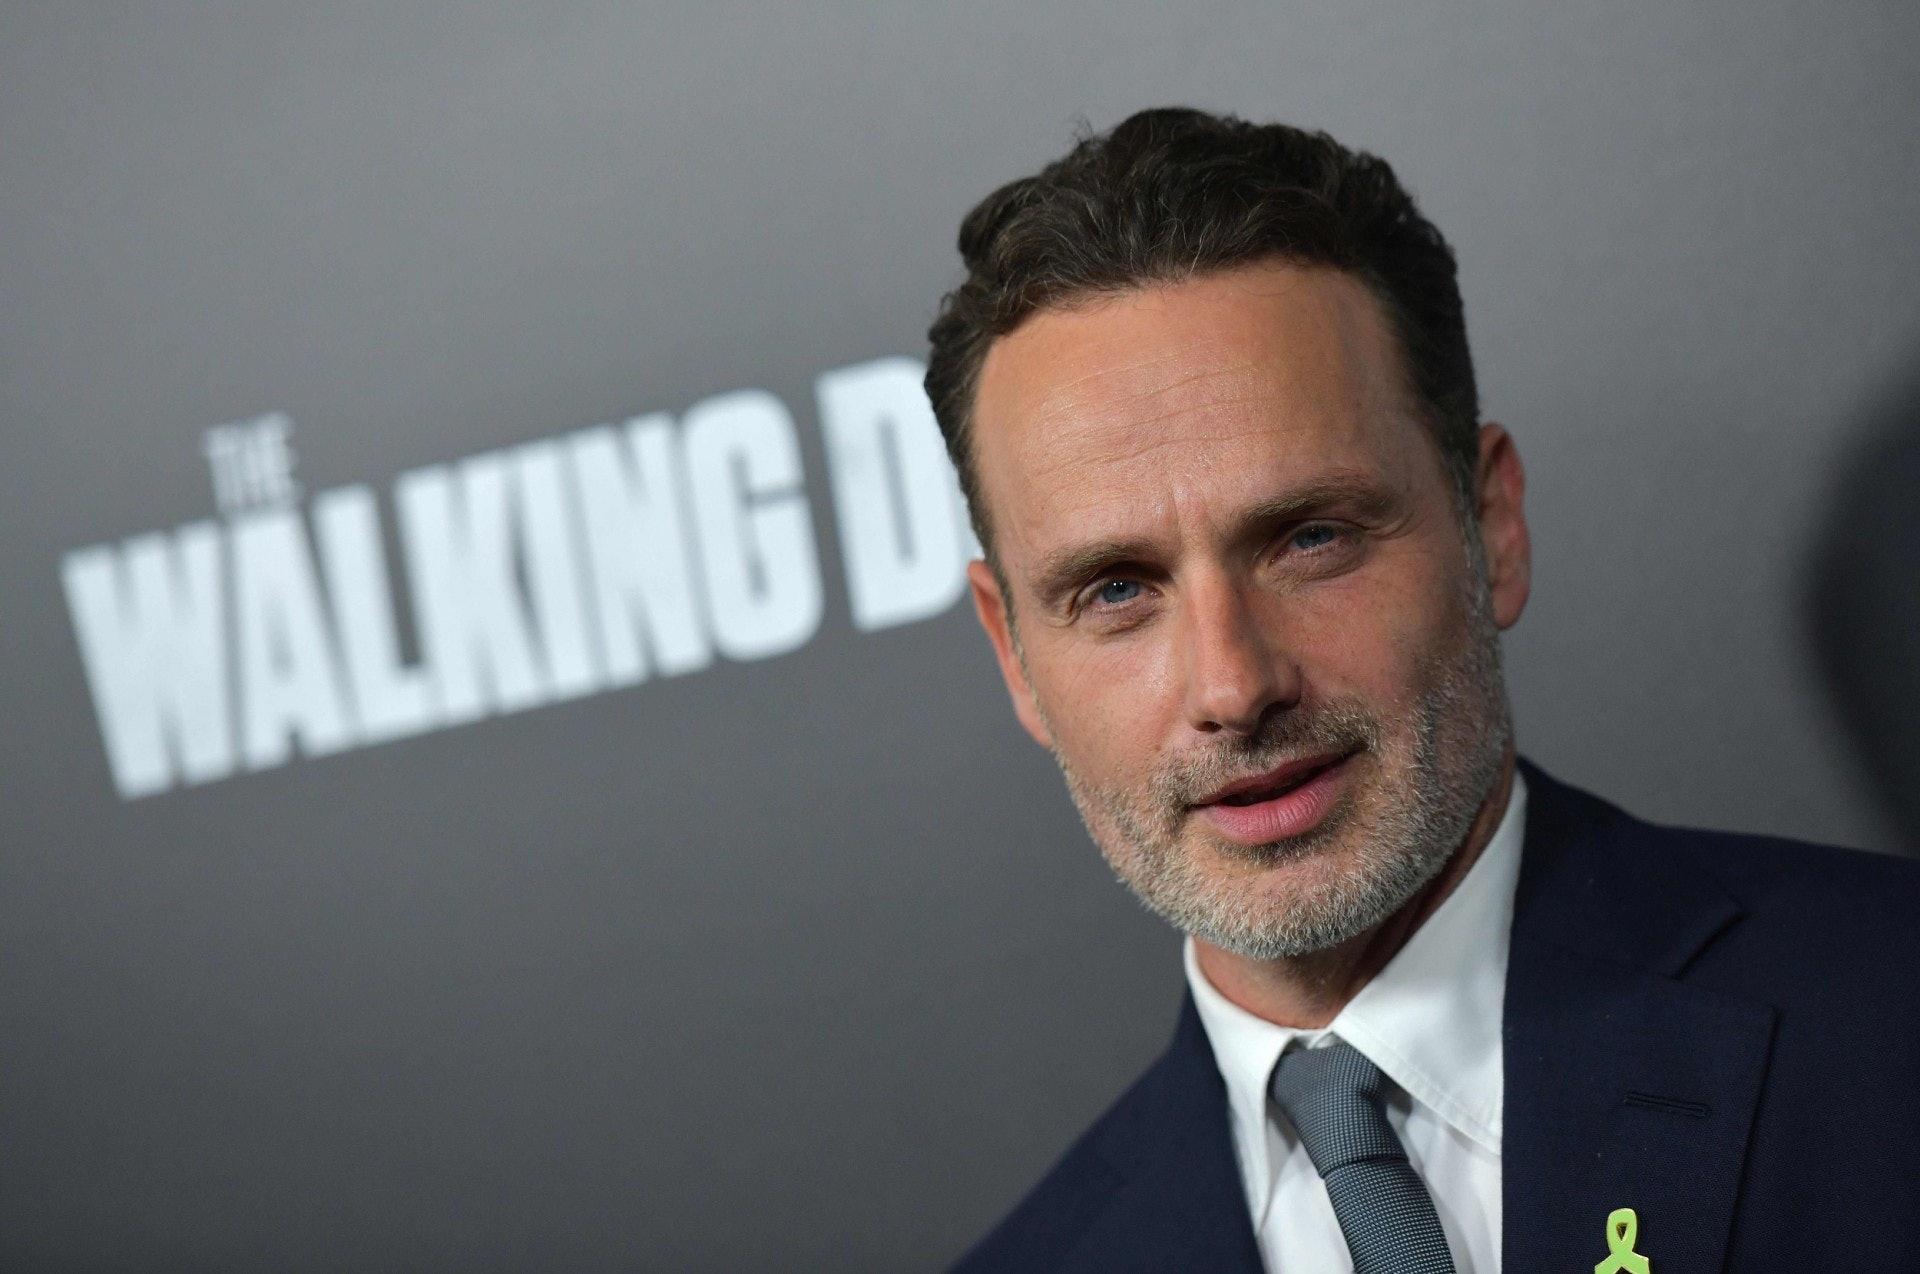 Andrew Lincoln憑藉《The Walking Dead》首次登榜,總收入1100 萬美金(約8630萬港元)。(視覺中國)